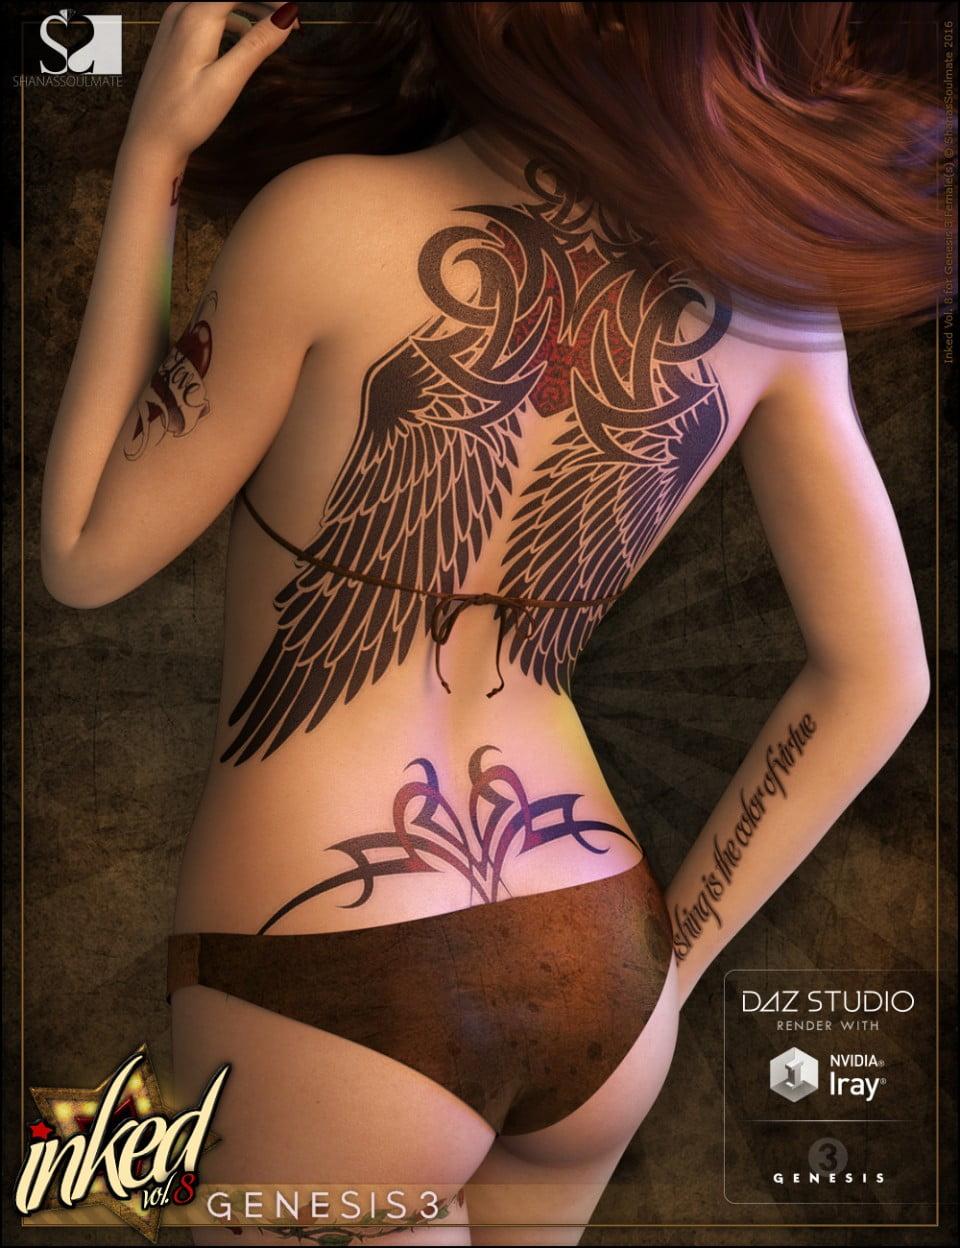 Inked Vol. 8 for Genesis 3 Female(s)